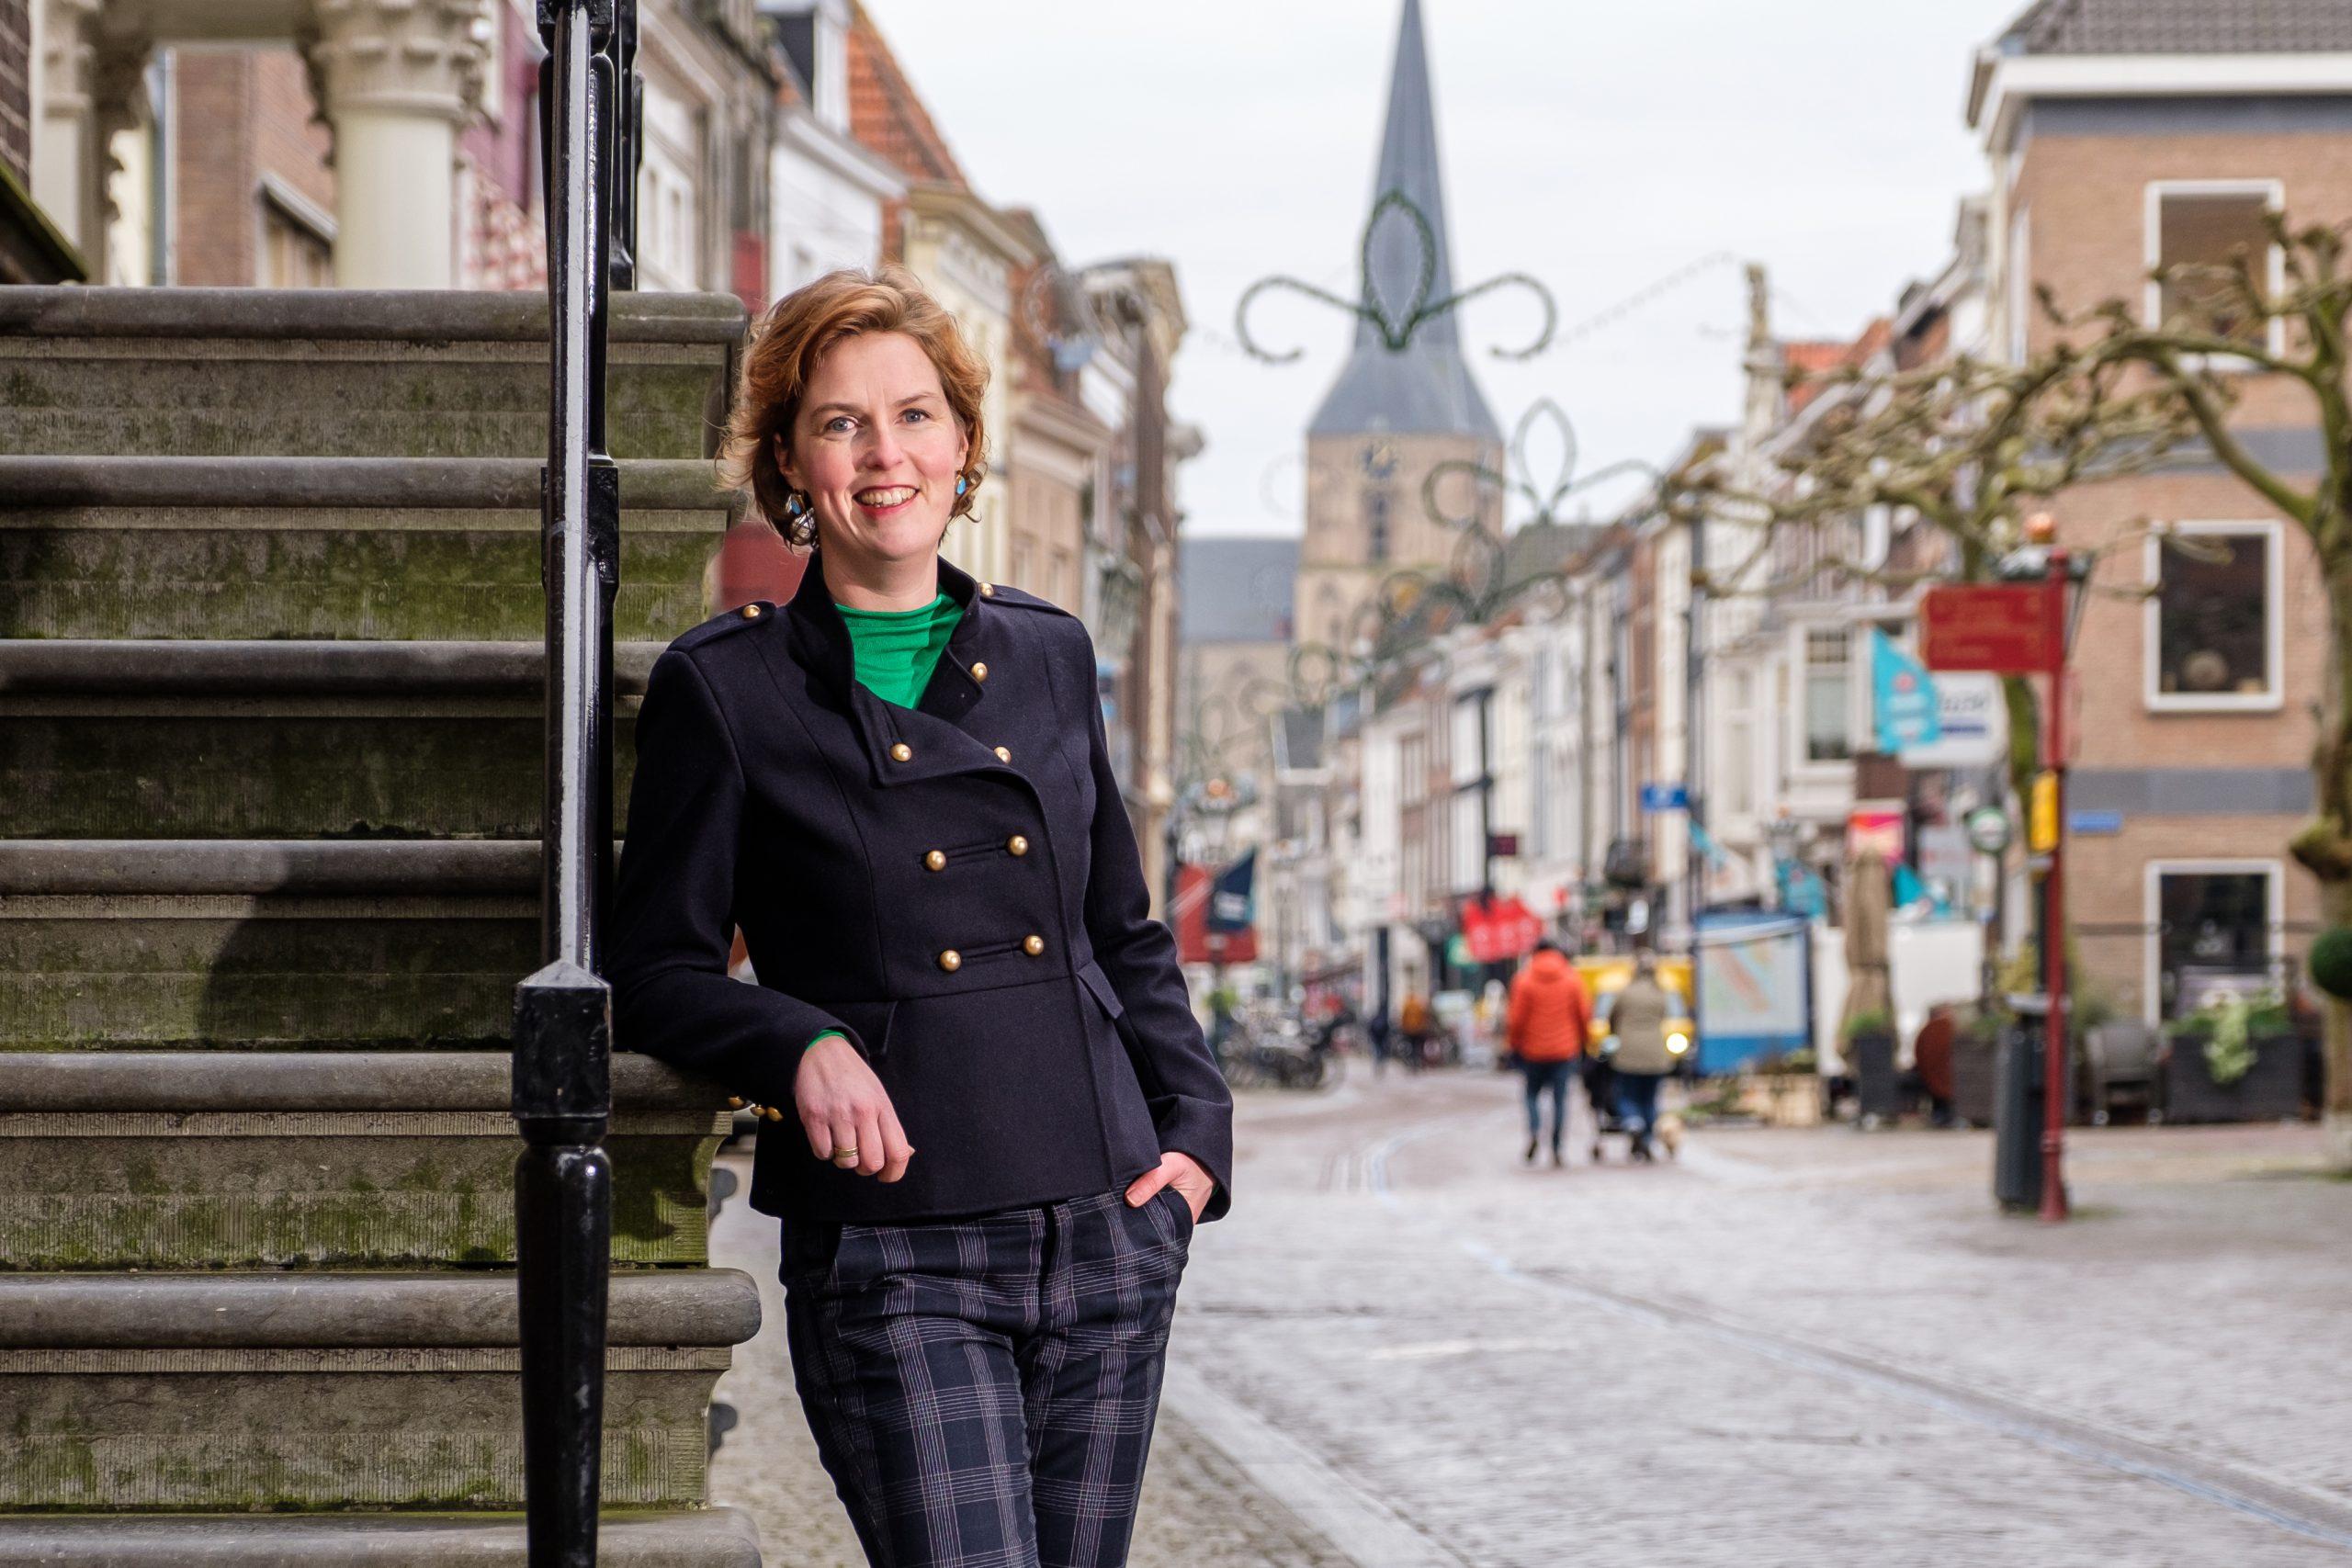 Ga in gesprek met Tweede Kamerlid Hilde Palland (CDA)